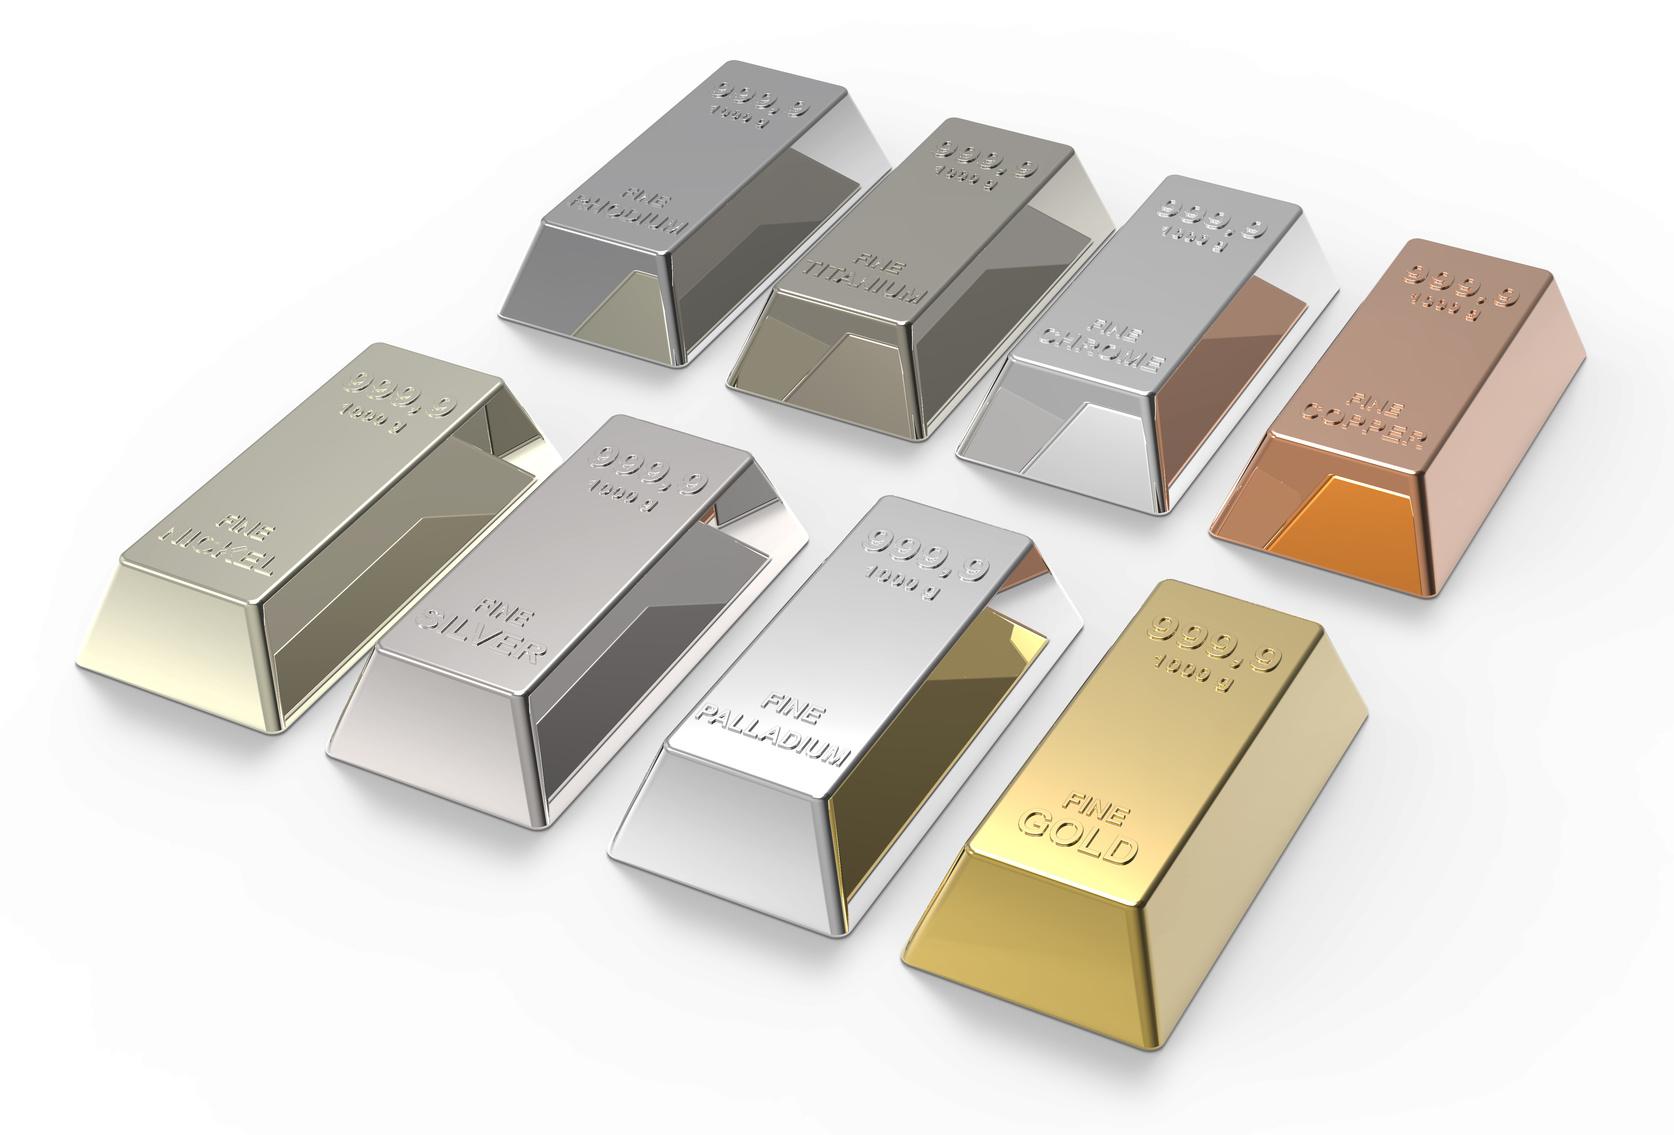 Gold bars © Piotr Pawinski / fotolia.com